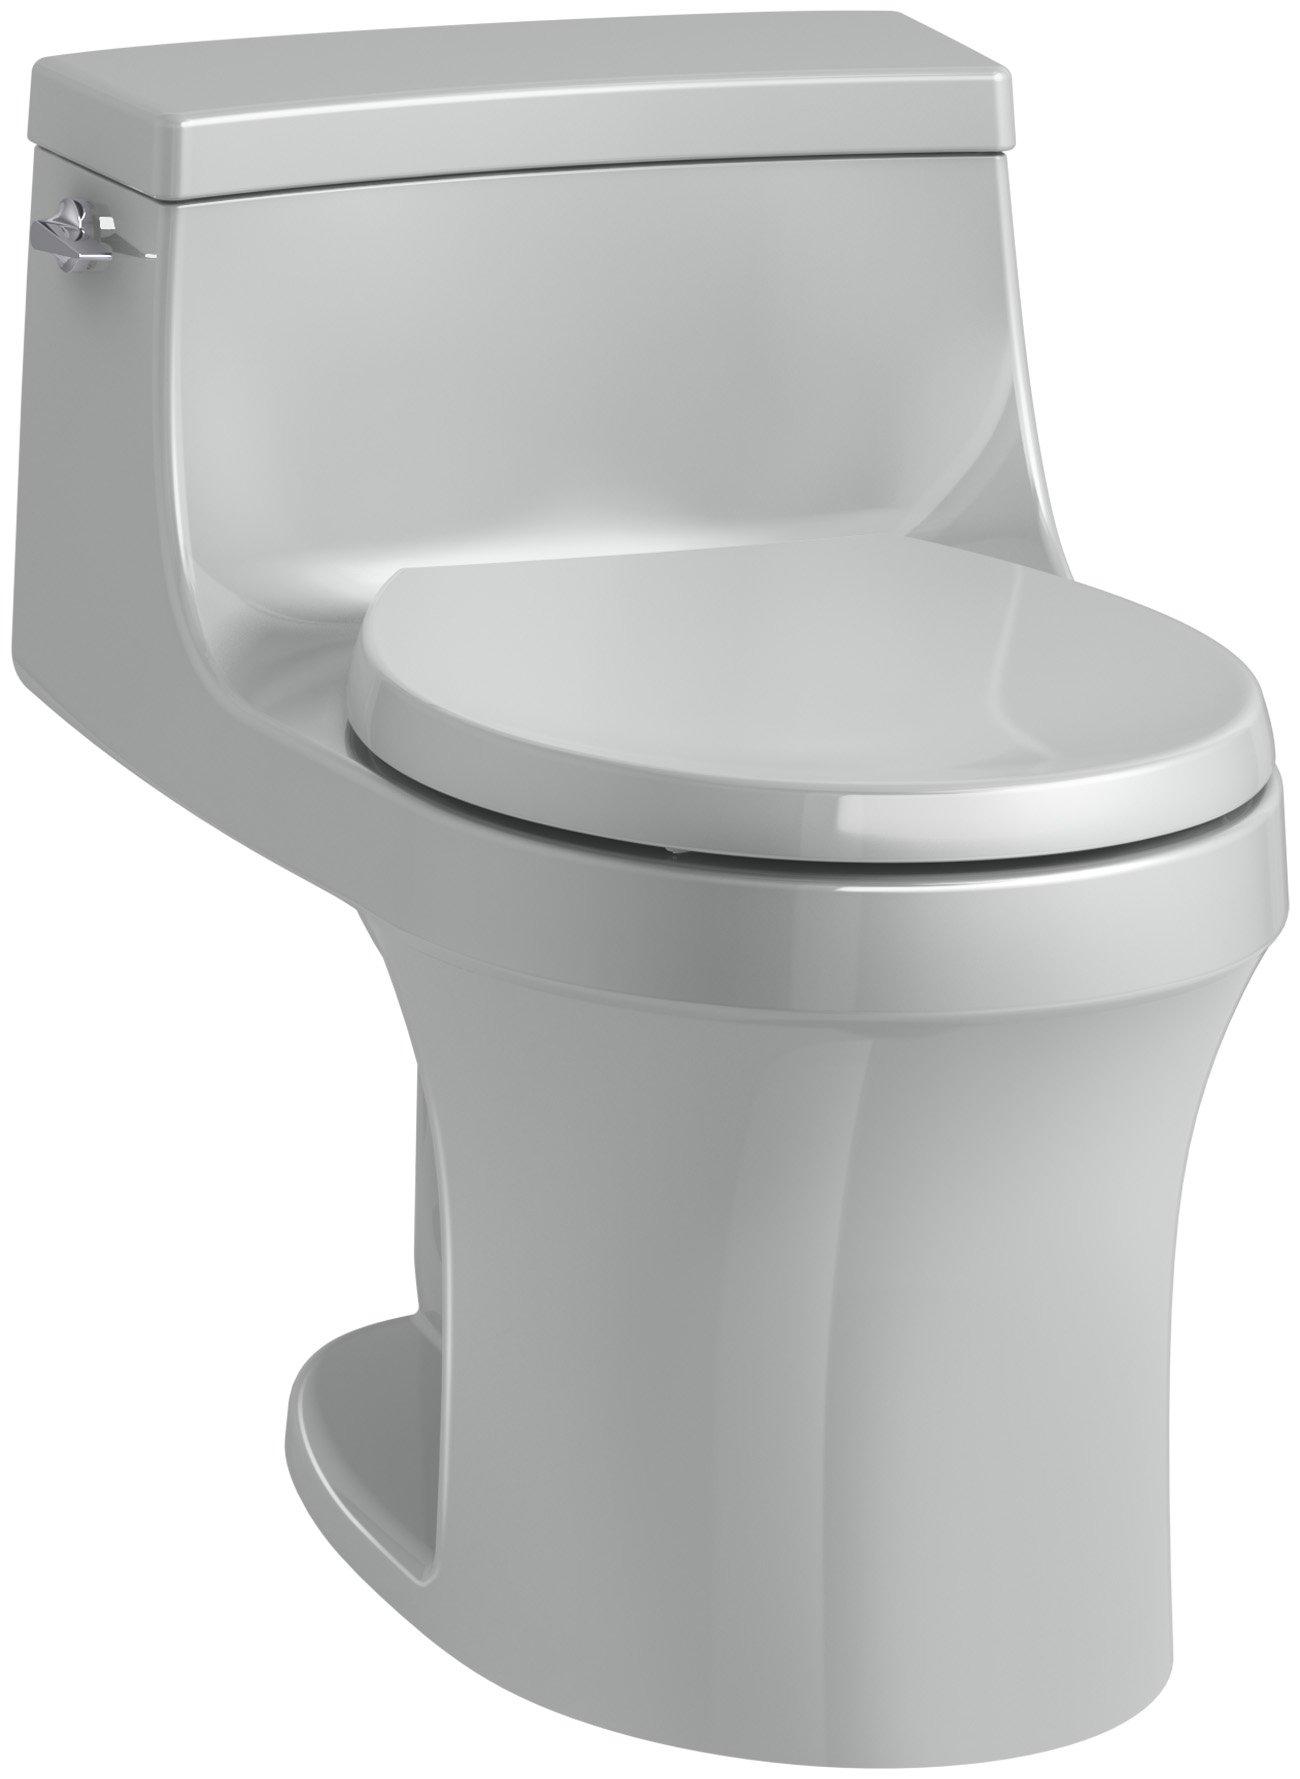 KOHLER K-4007-95 San Souci Round-Front 1.28 GPF Toilet with AquaPiston Flushing Technology and Left-Hand Trip Lever, Ice Grey, 1-Piece